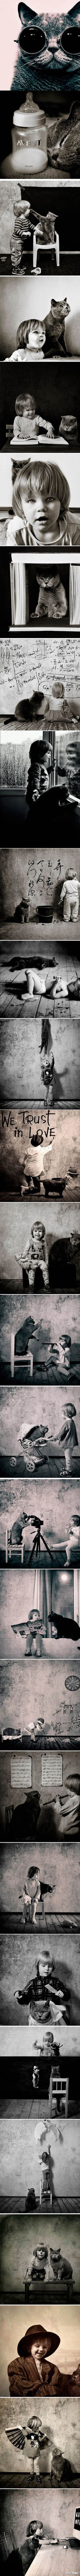 Cat and kid  via Vesna Kustudic via Chloe Cao